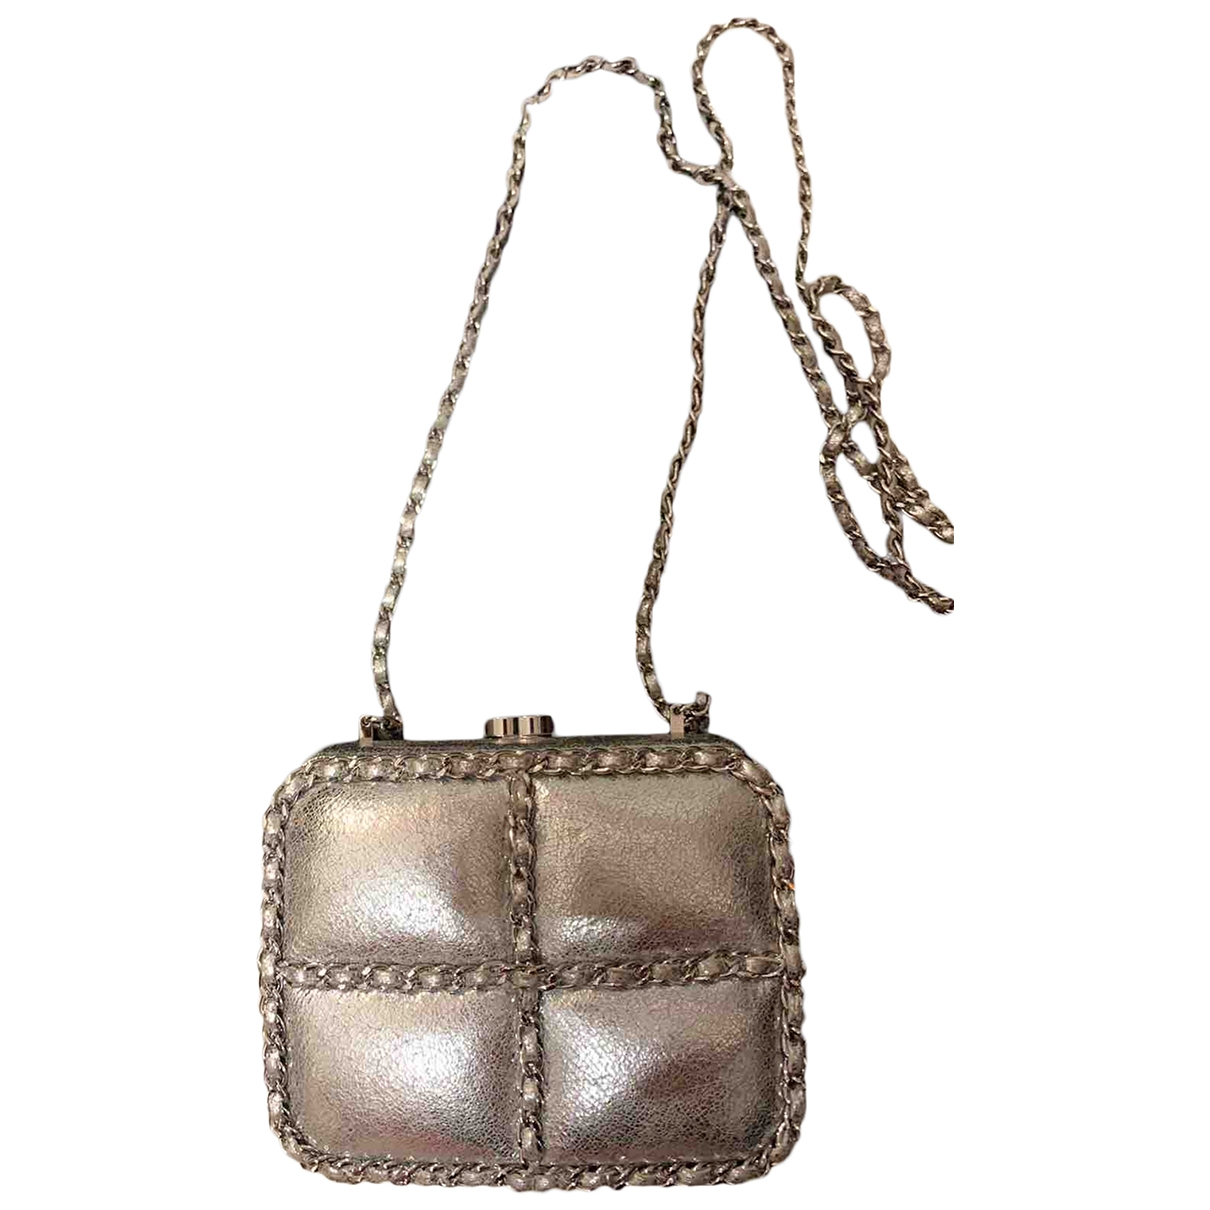 Chanel \N Silver Leather Clutch bag for Women \N